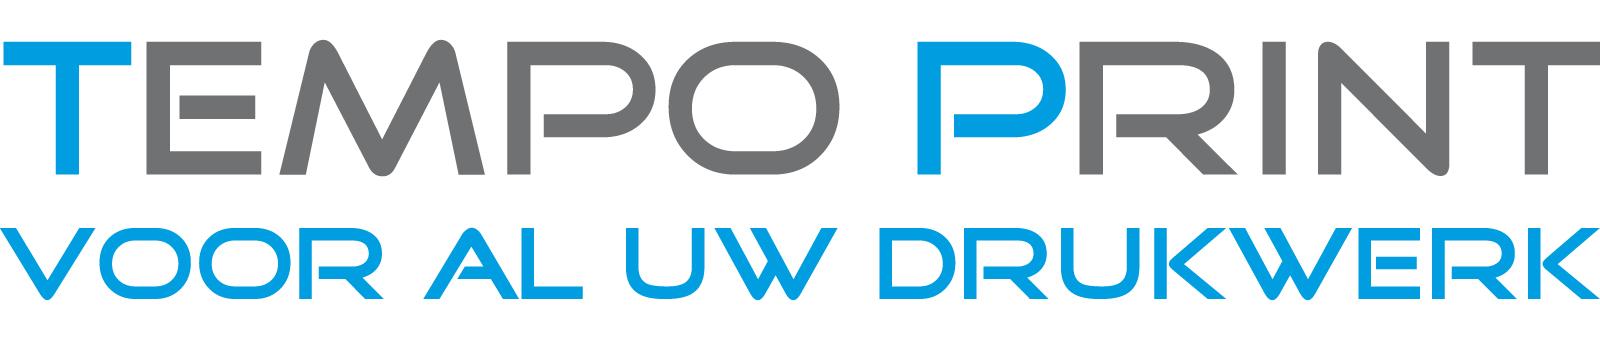 Tempoprint logo